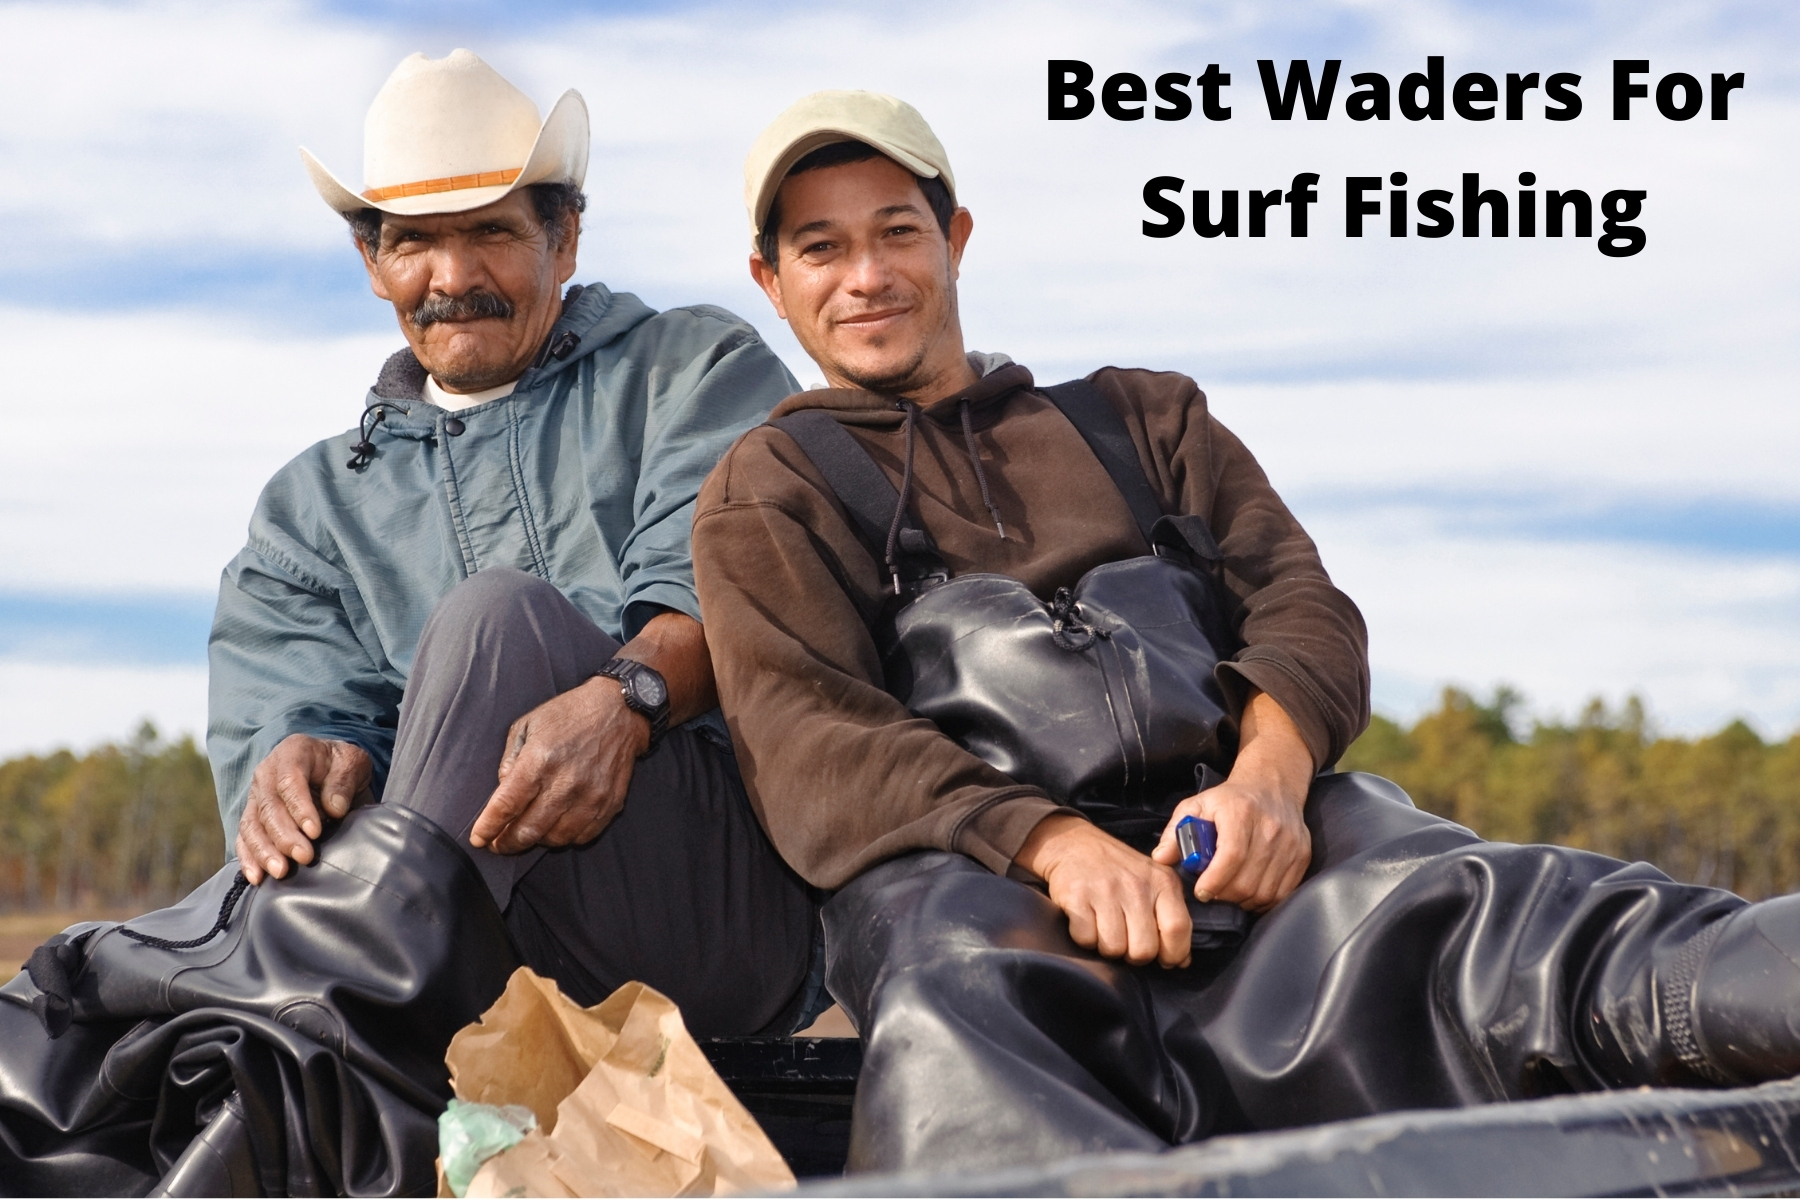 waders fishing pulling surf premium freeimages picks